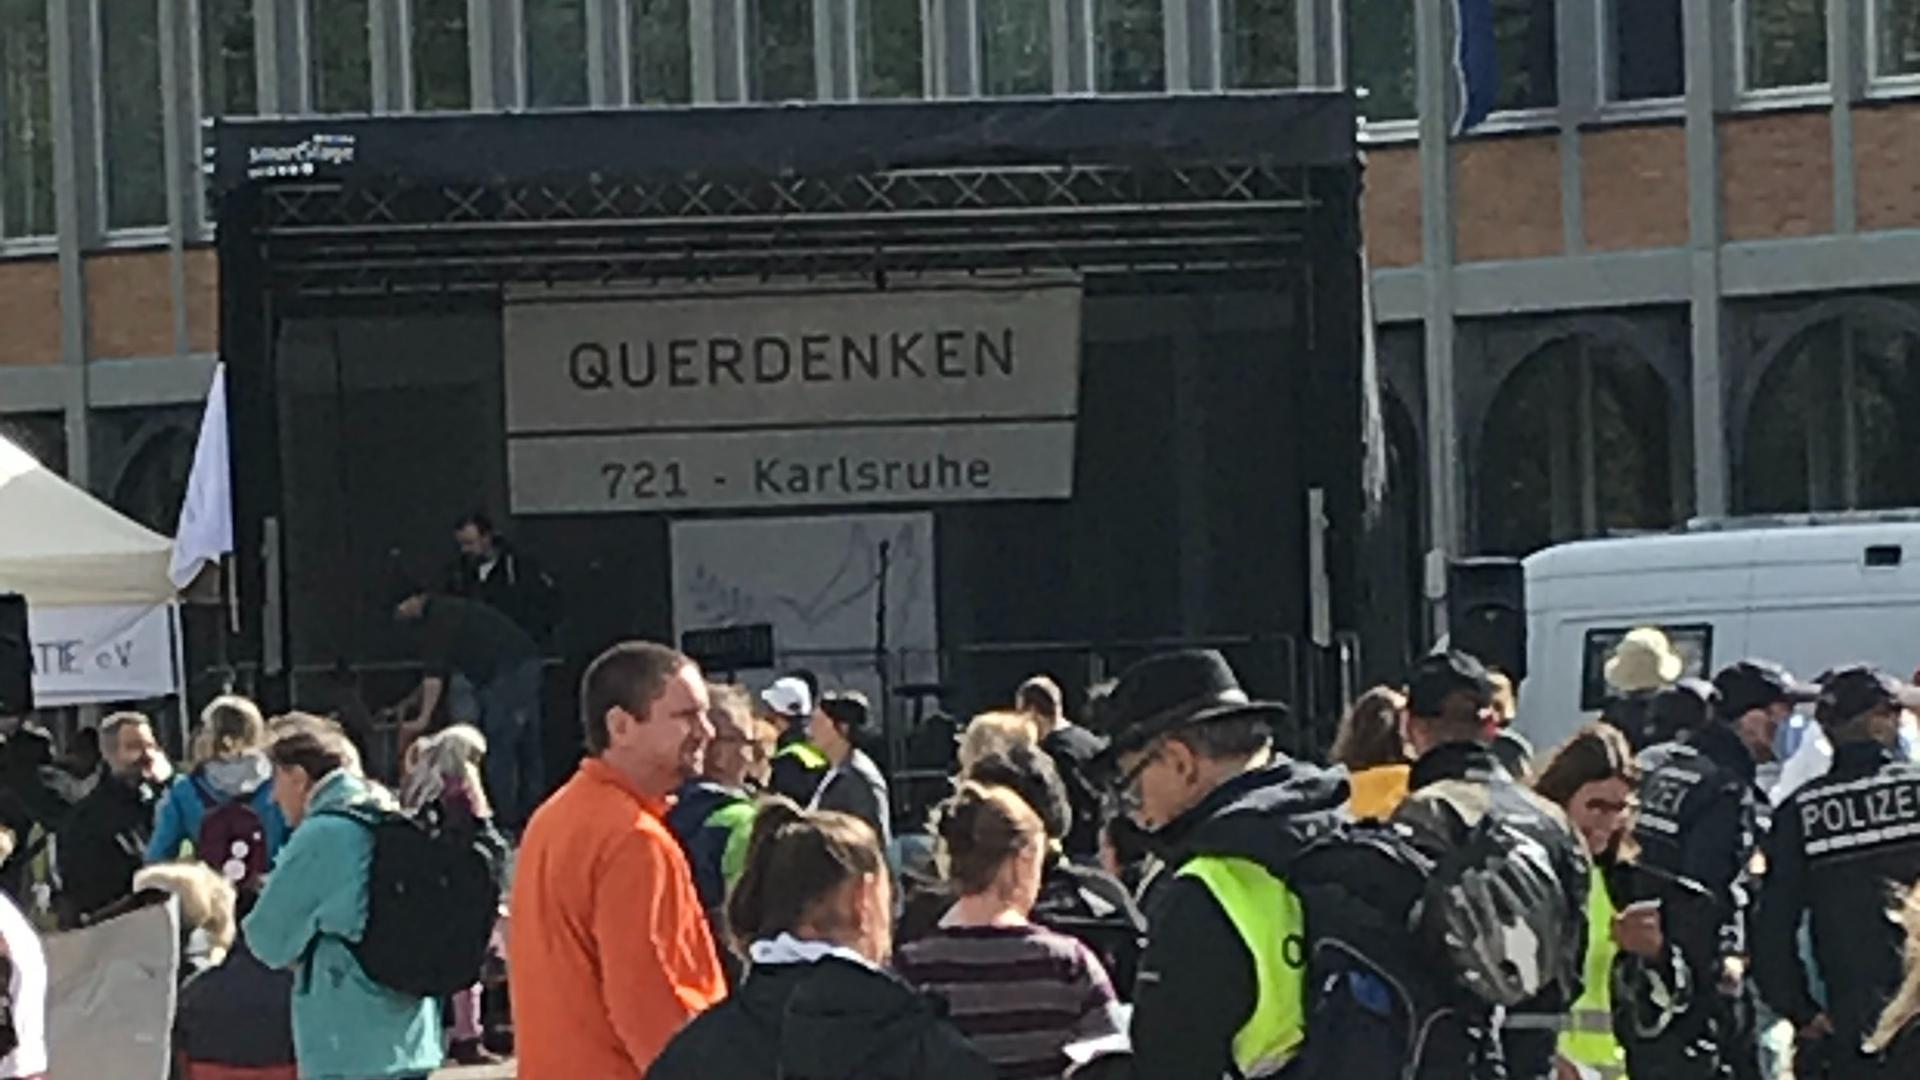 Querdenken in Karlsruhe